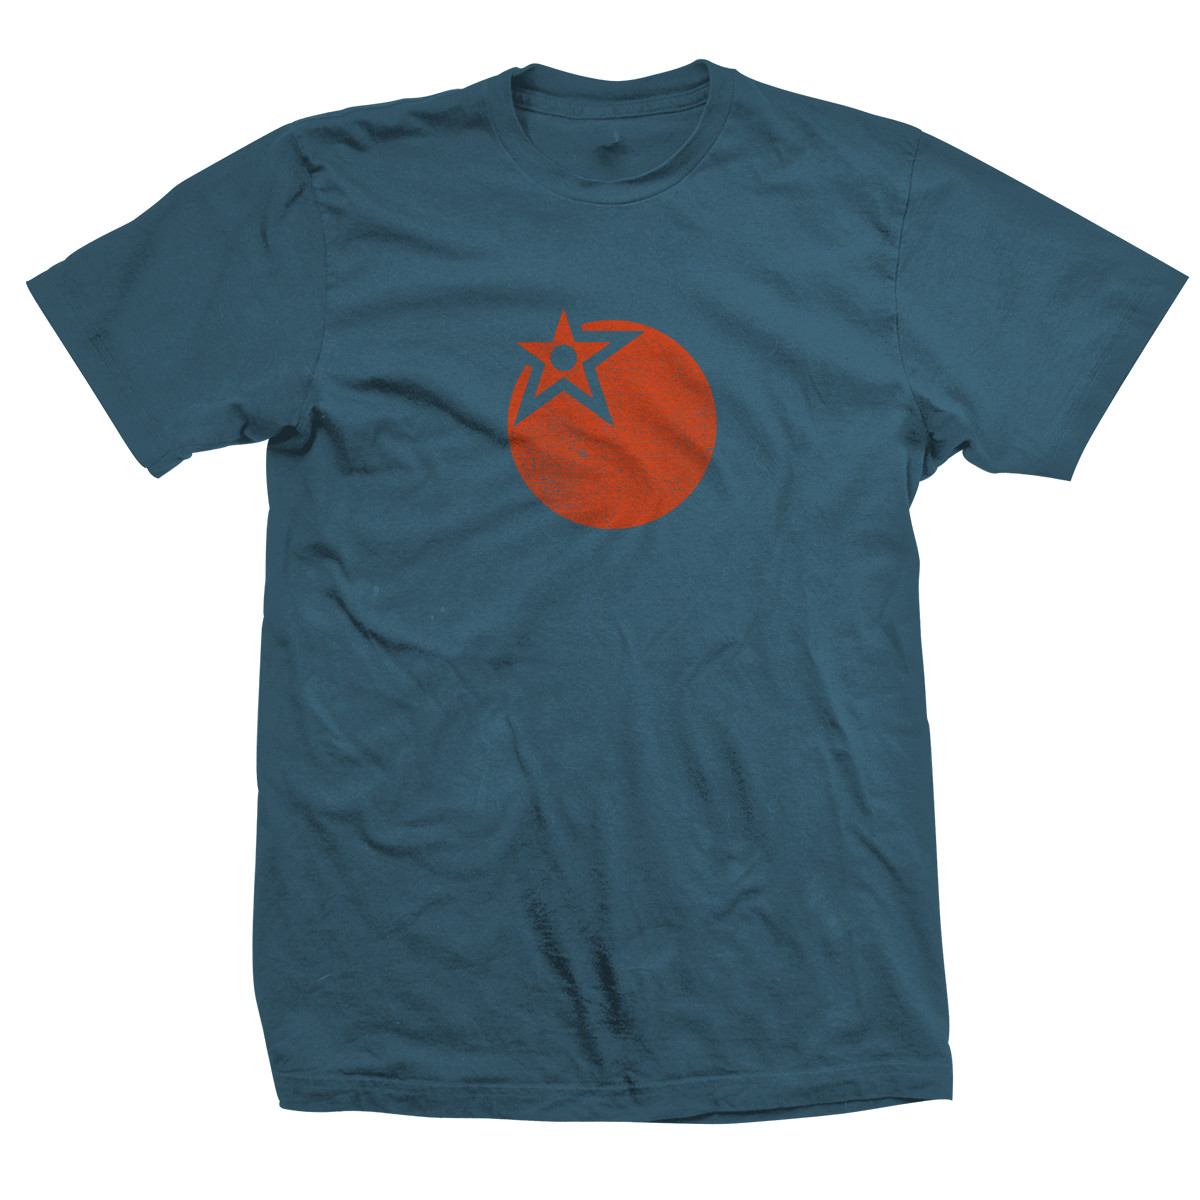 Heart or Orange Stargazer Tee Front